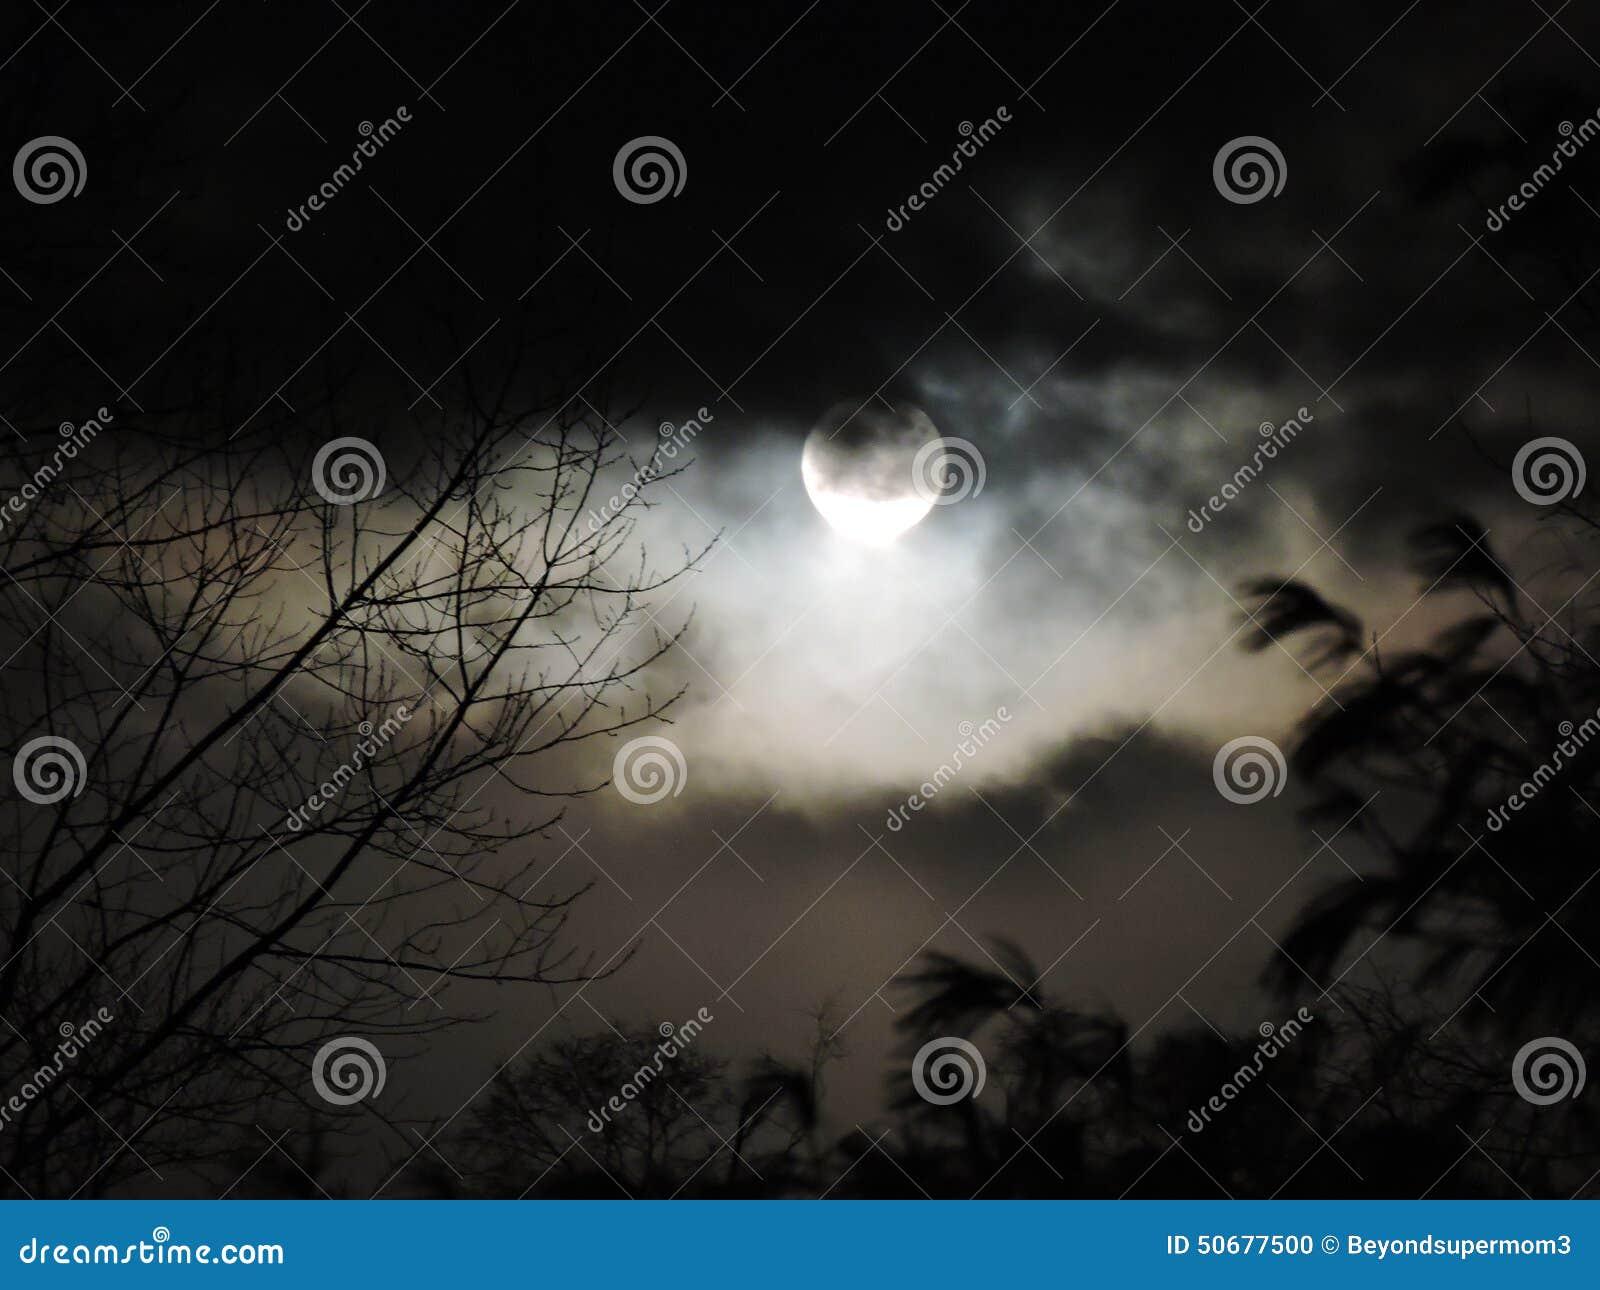 Download 与云层辗压的满月 库存照片. 图片 包括有 云彩, 杉木, 充分, 月亮, 结构树, 覆盖范围, 白兰地酒 - 50677500